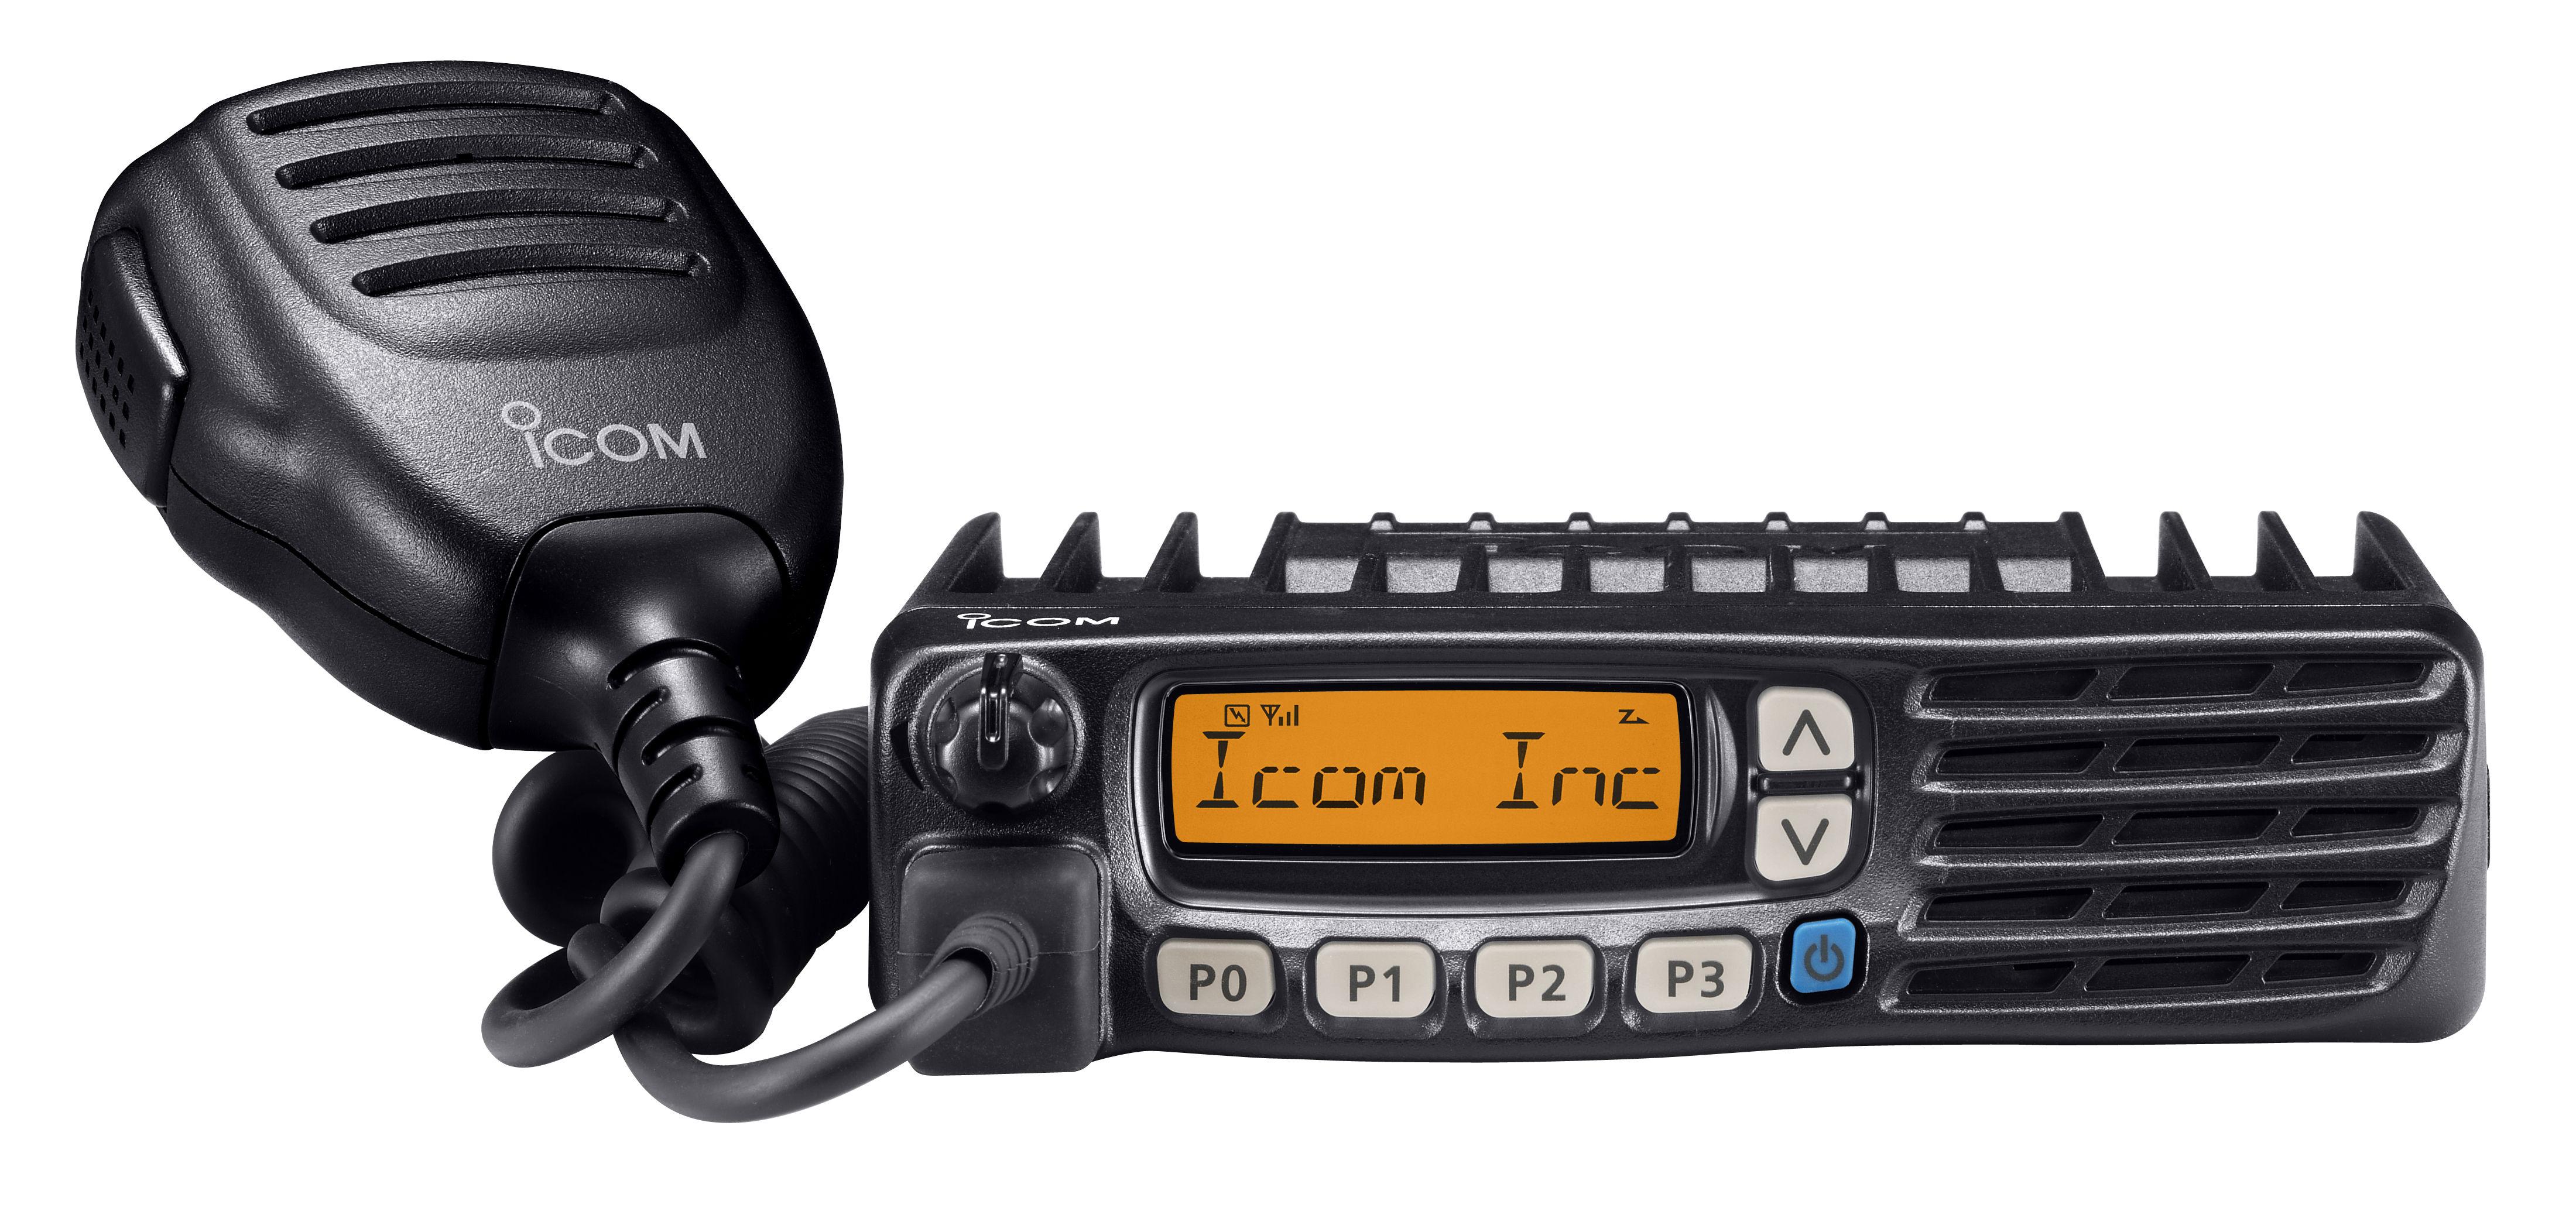 ICOM IC-F5022: Catálogo de Olanni Electronics